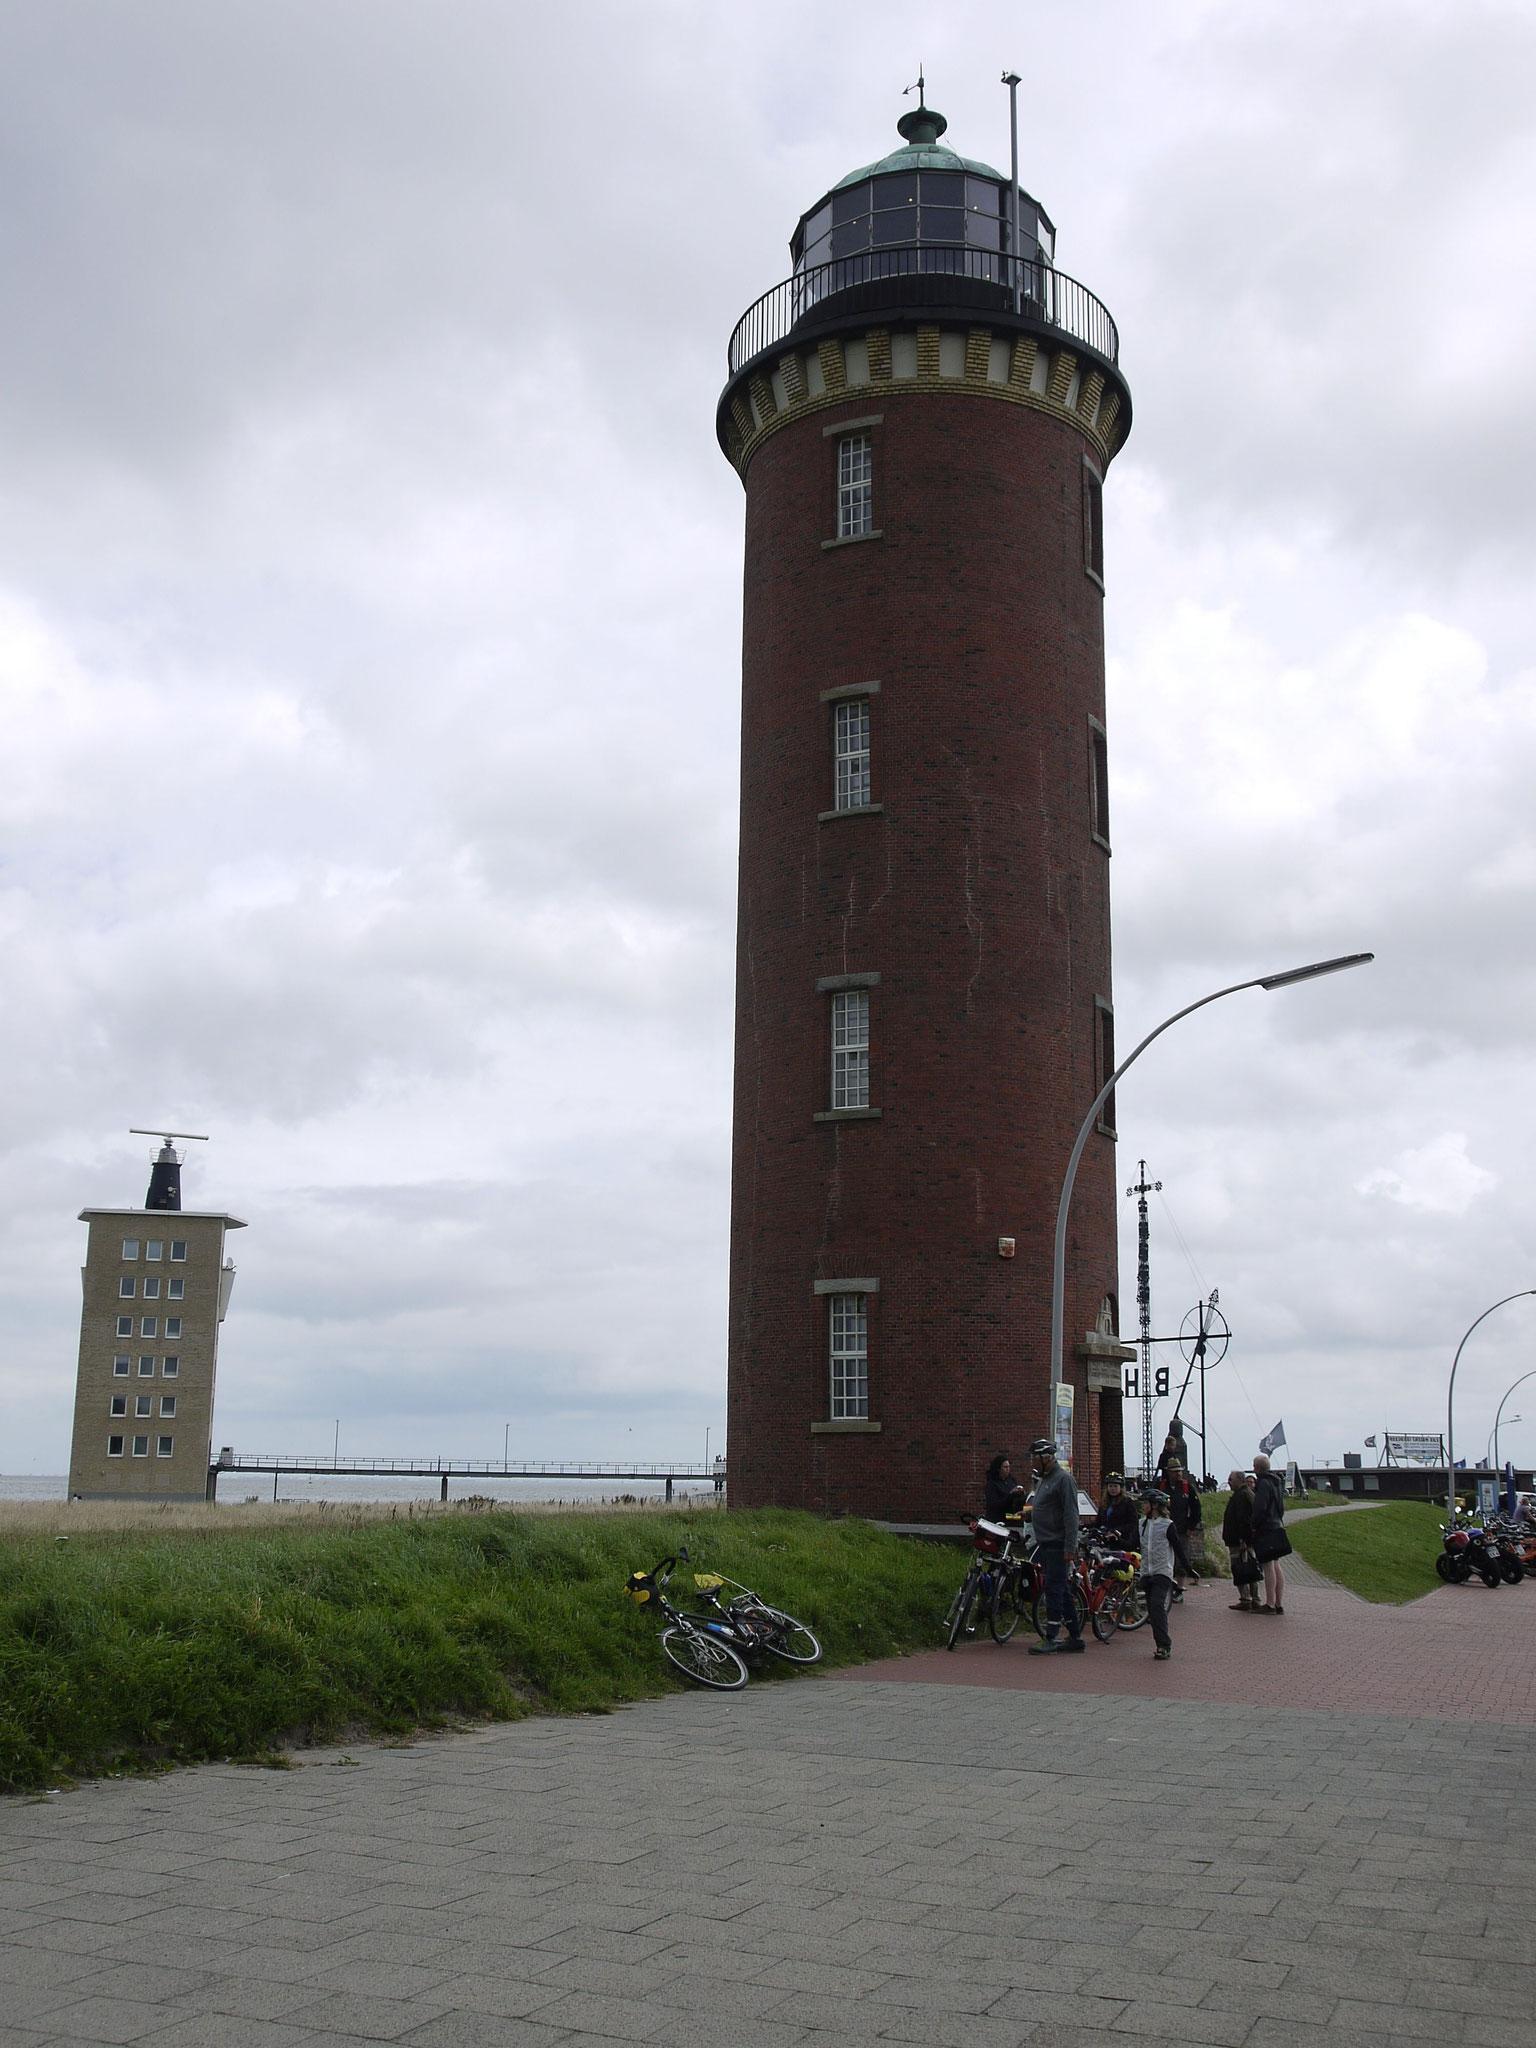 Hamburger Leuchturm, unser End-Endziel an der Alten Liebe Cuxhaven